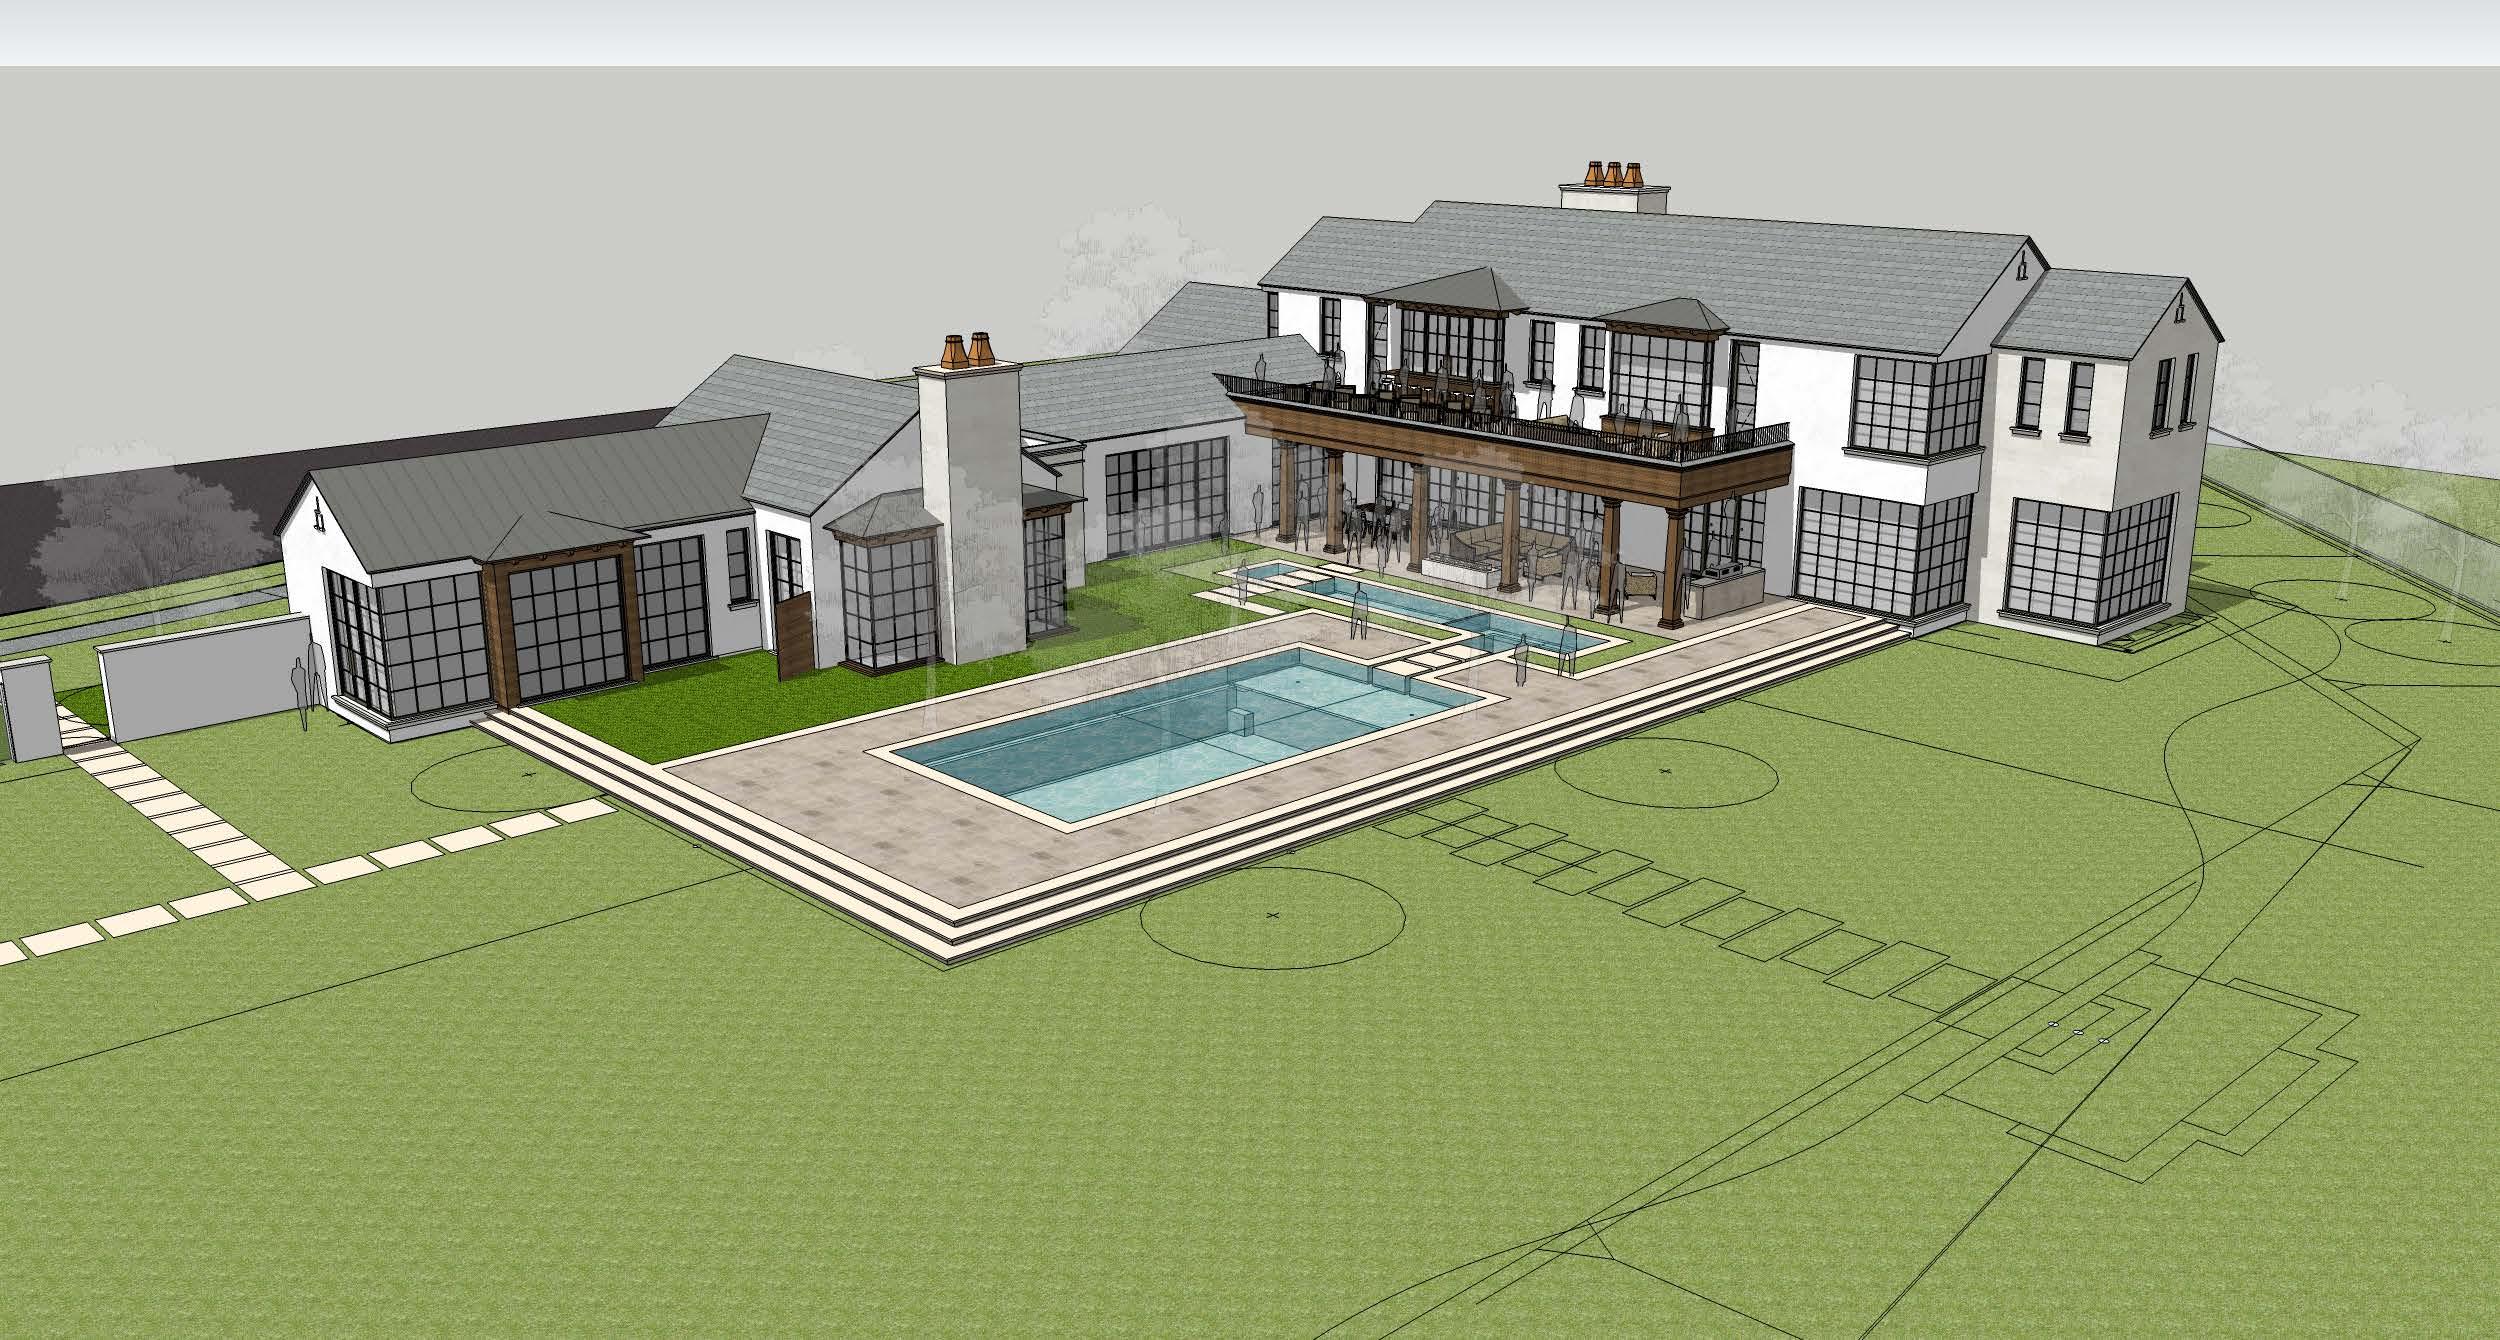 17-080_Vyas Residence_Model Views_Design Review_Page_2.jpg